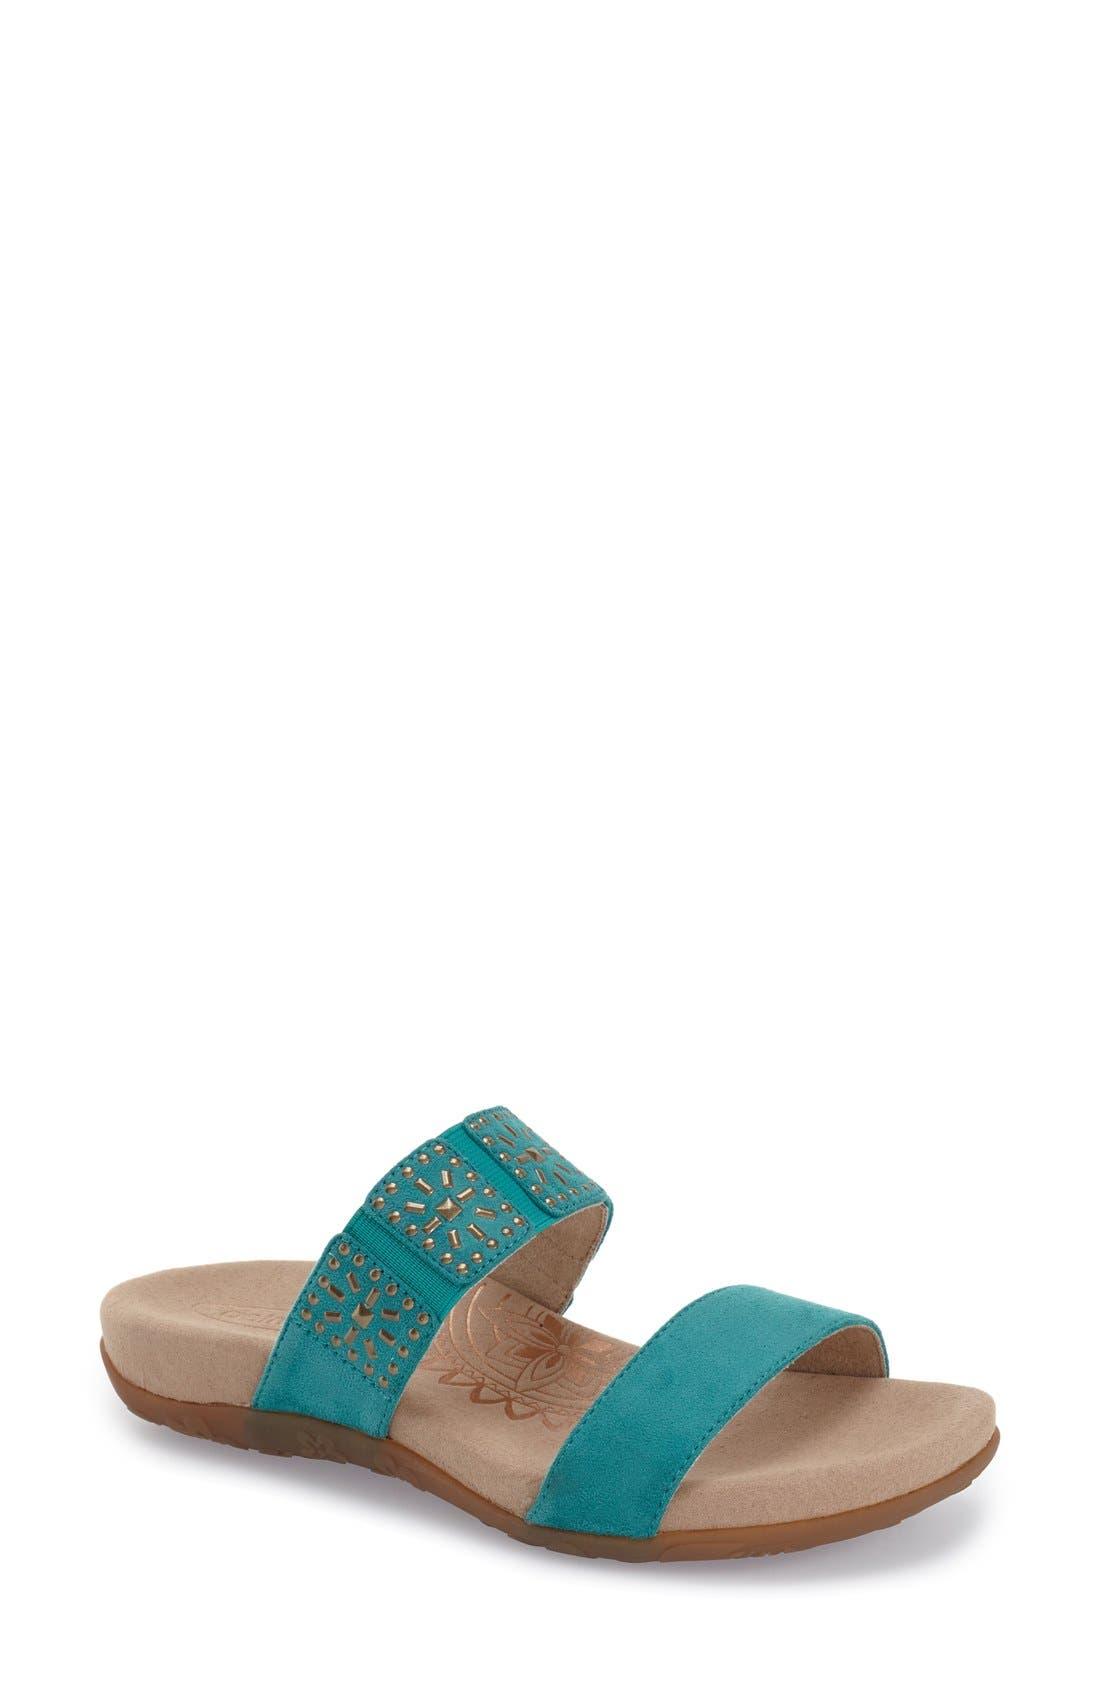 Aetrex 'Macy' Double Band Slide Sandal (Women)